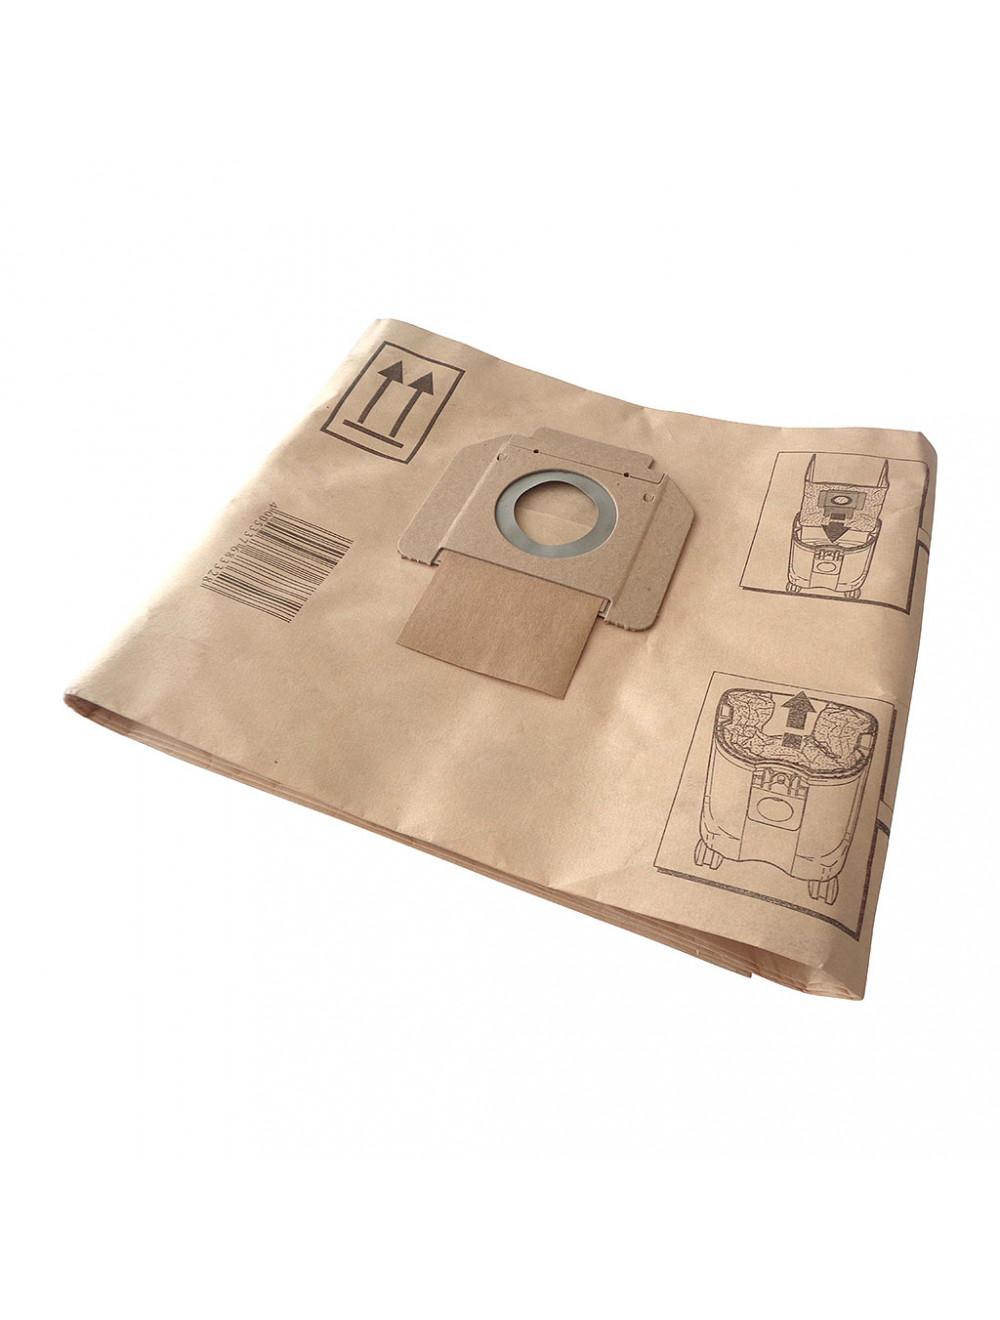 Das Produkt Reitel DUSTY ZIRKON Filtertüten 27804000 aus dem Global-dent online shop.